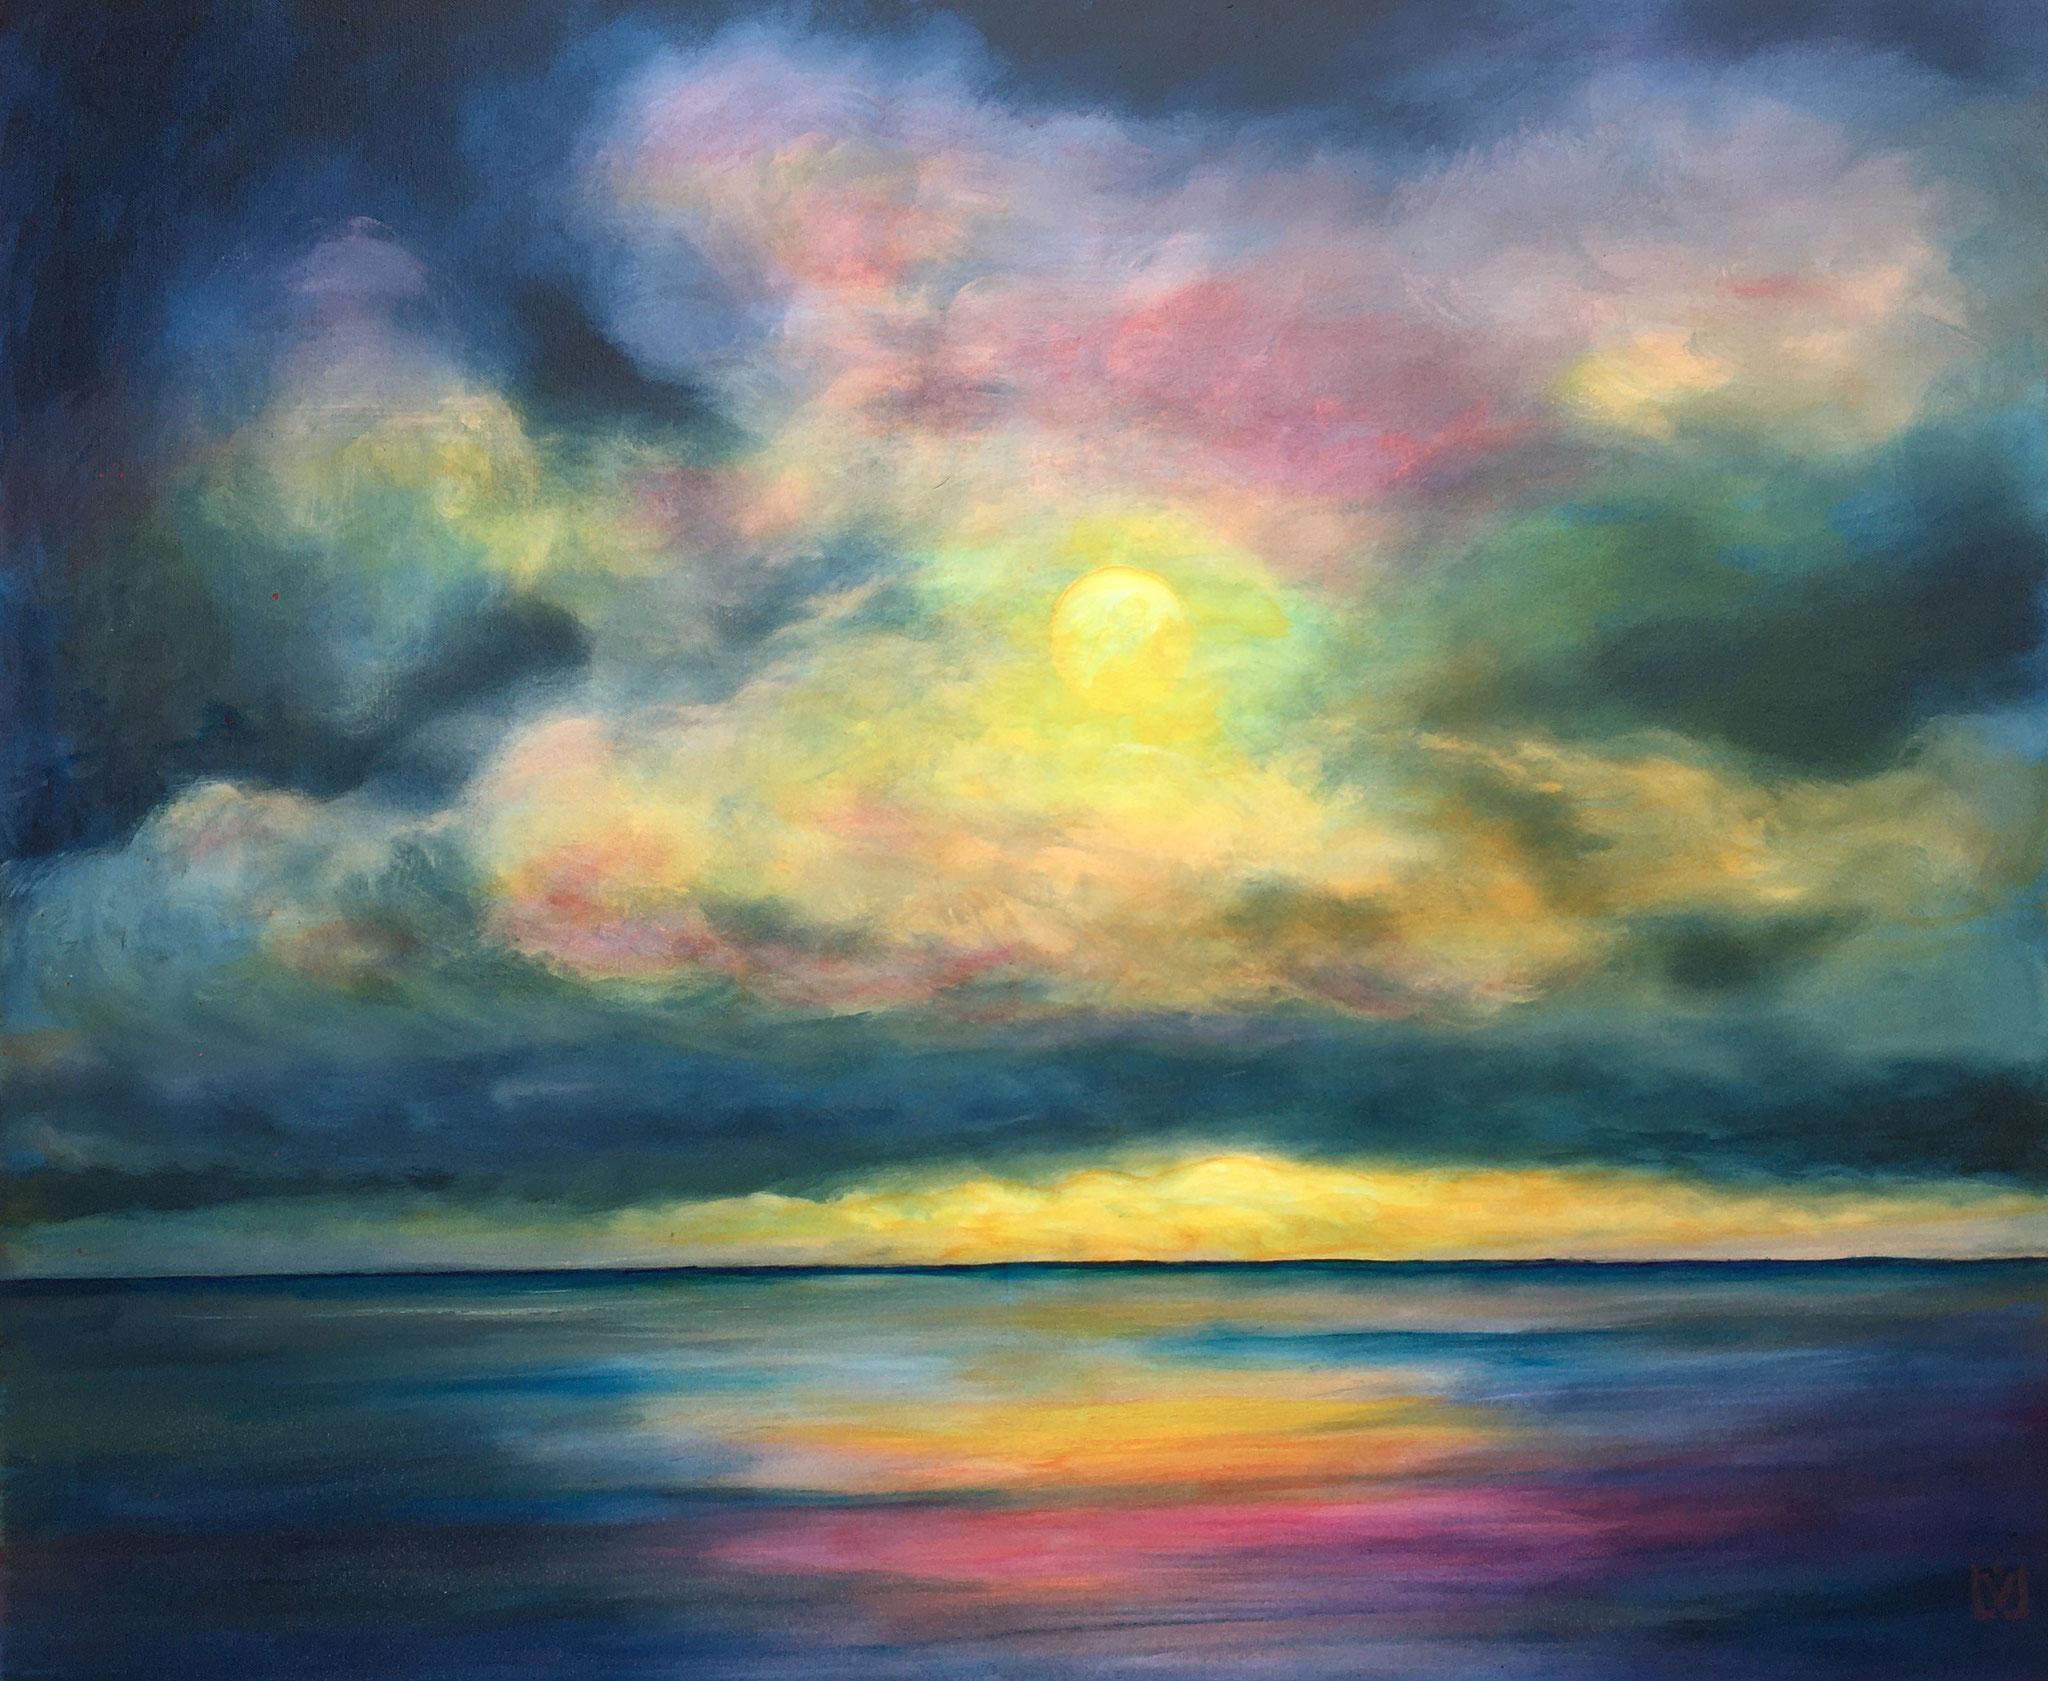 moonlight-rhapsody 90 x 110 cm Acryl auf Leinwand, reserviert